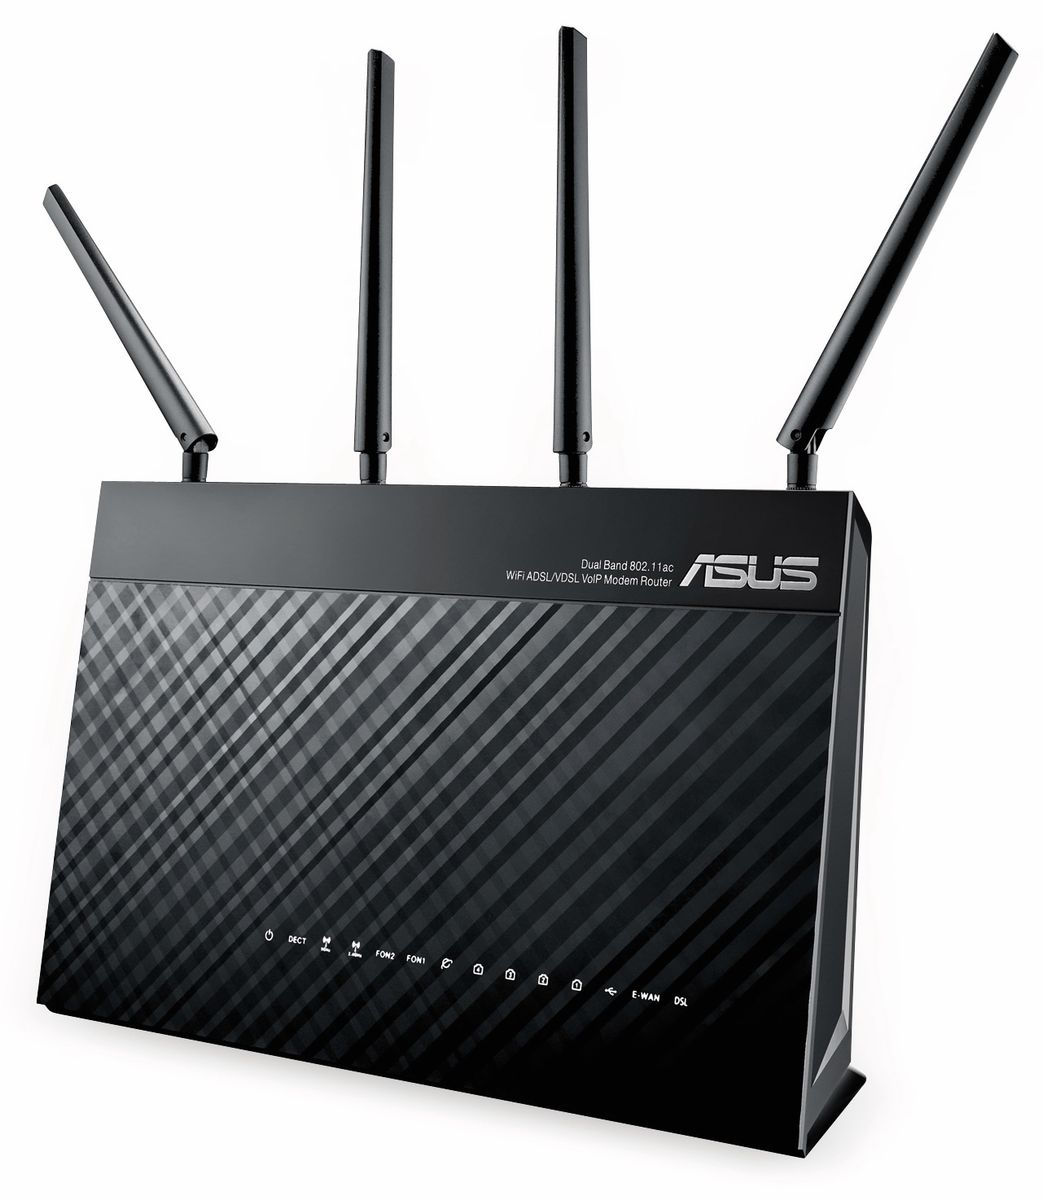 WLAN-Router ASUS DSL-AC87VG